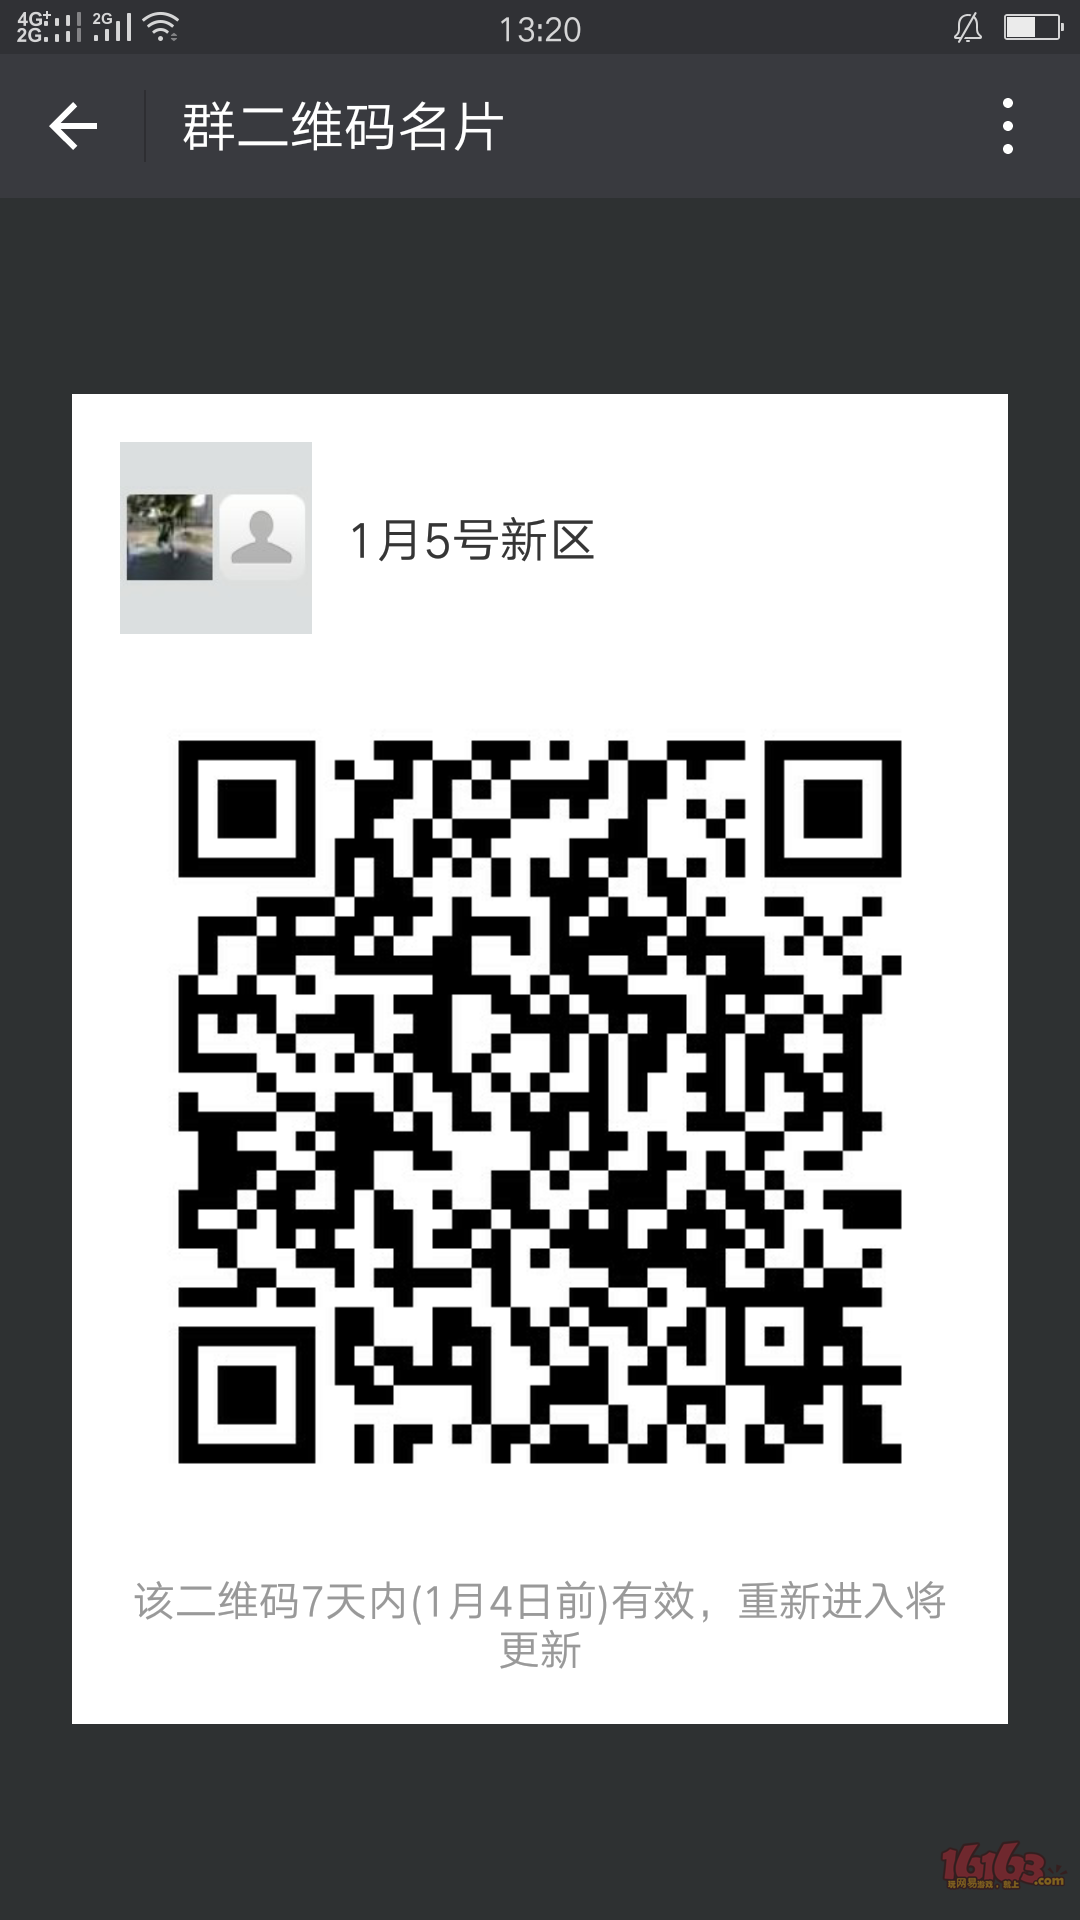 Screenshot_2017-12-28-13-20-07-43.png